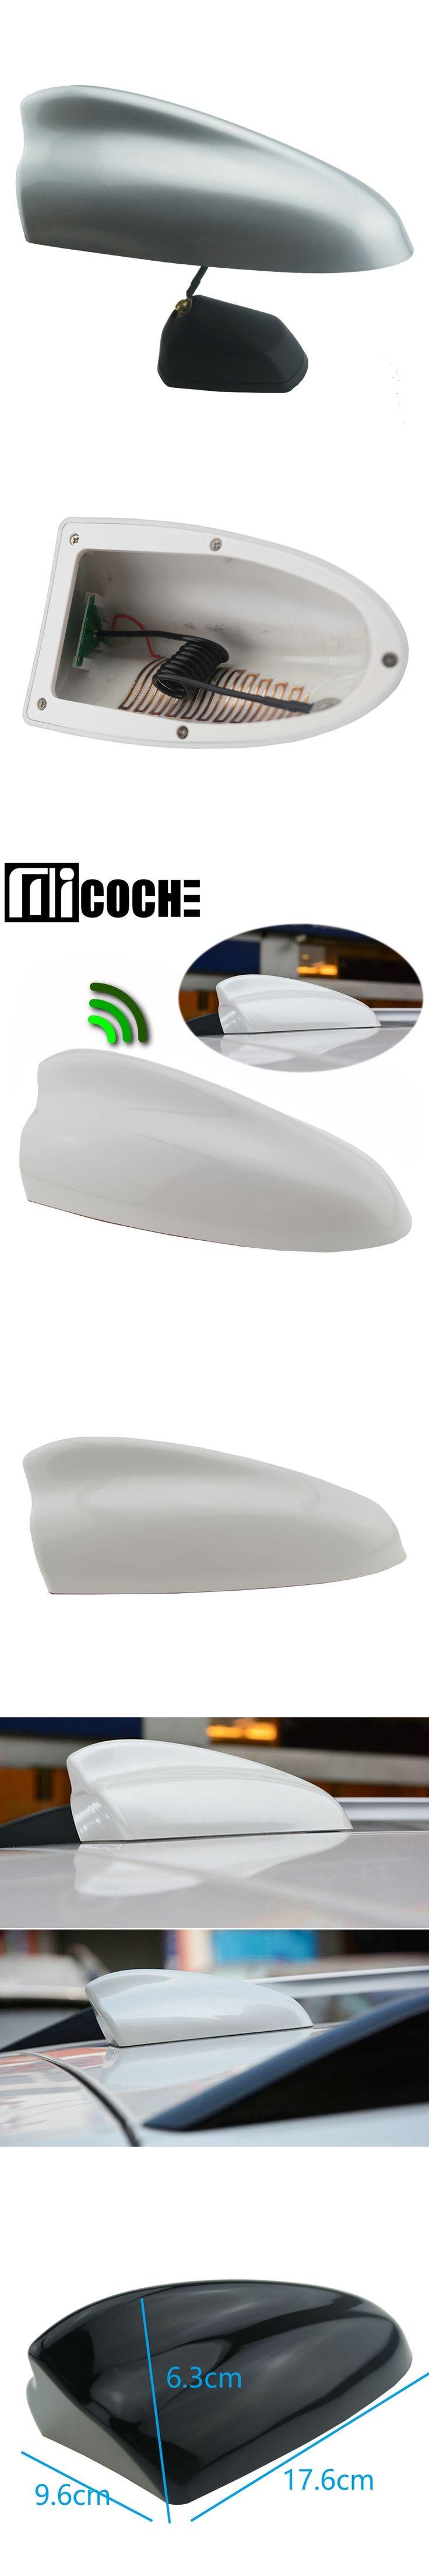 1pcs Car Shark fin Antenna for Lexus CT 200h Auto Radio Aerials Replacement Antenna Sharkfin Black White Silver